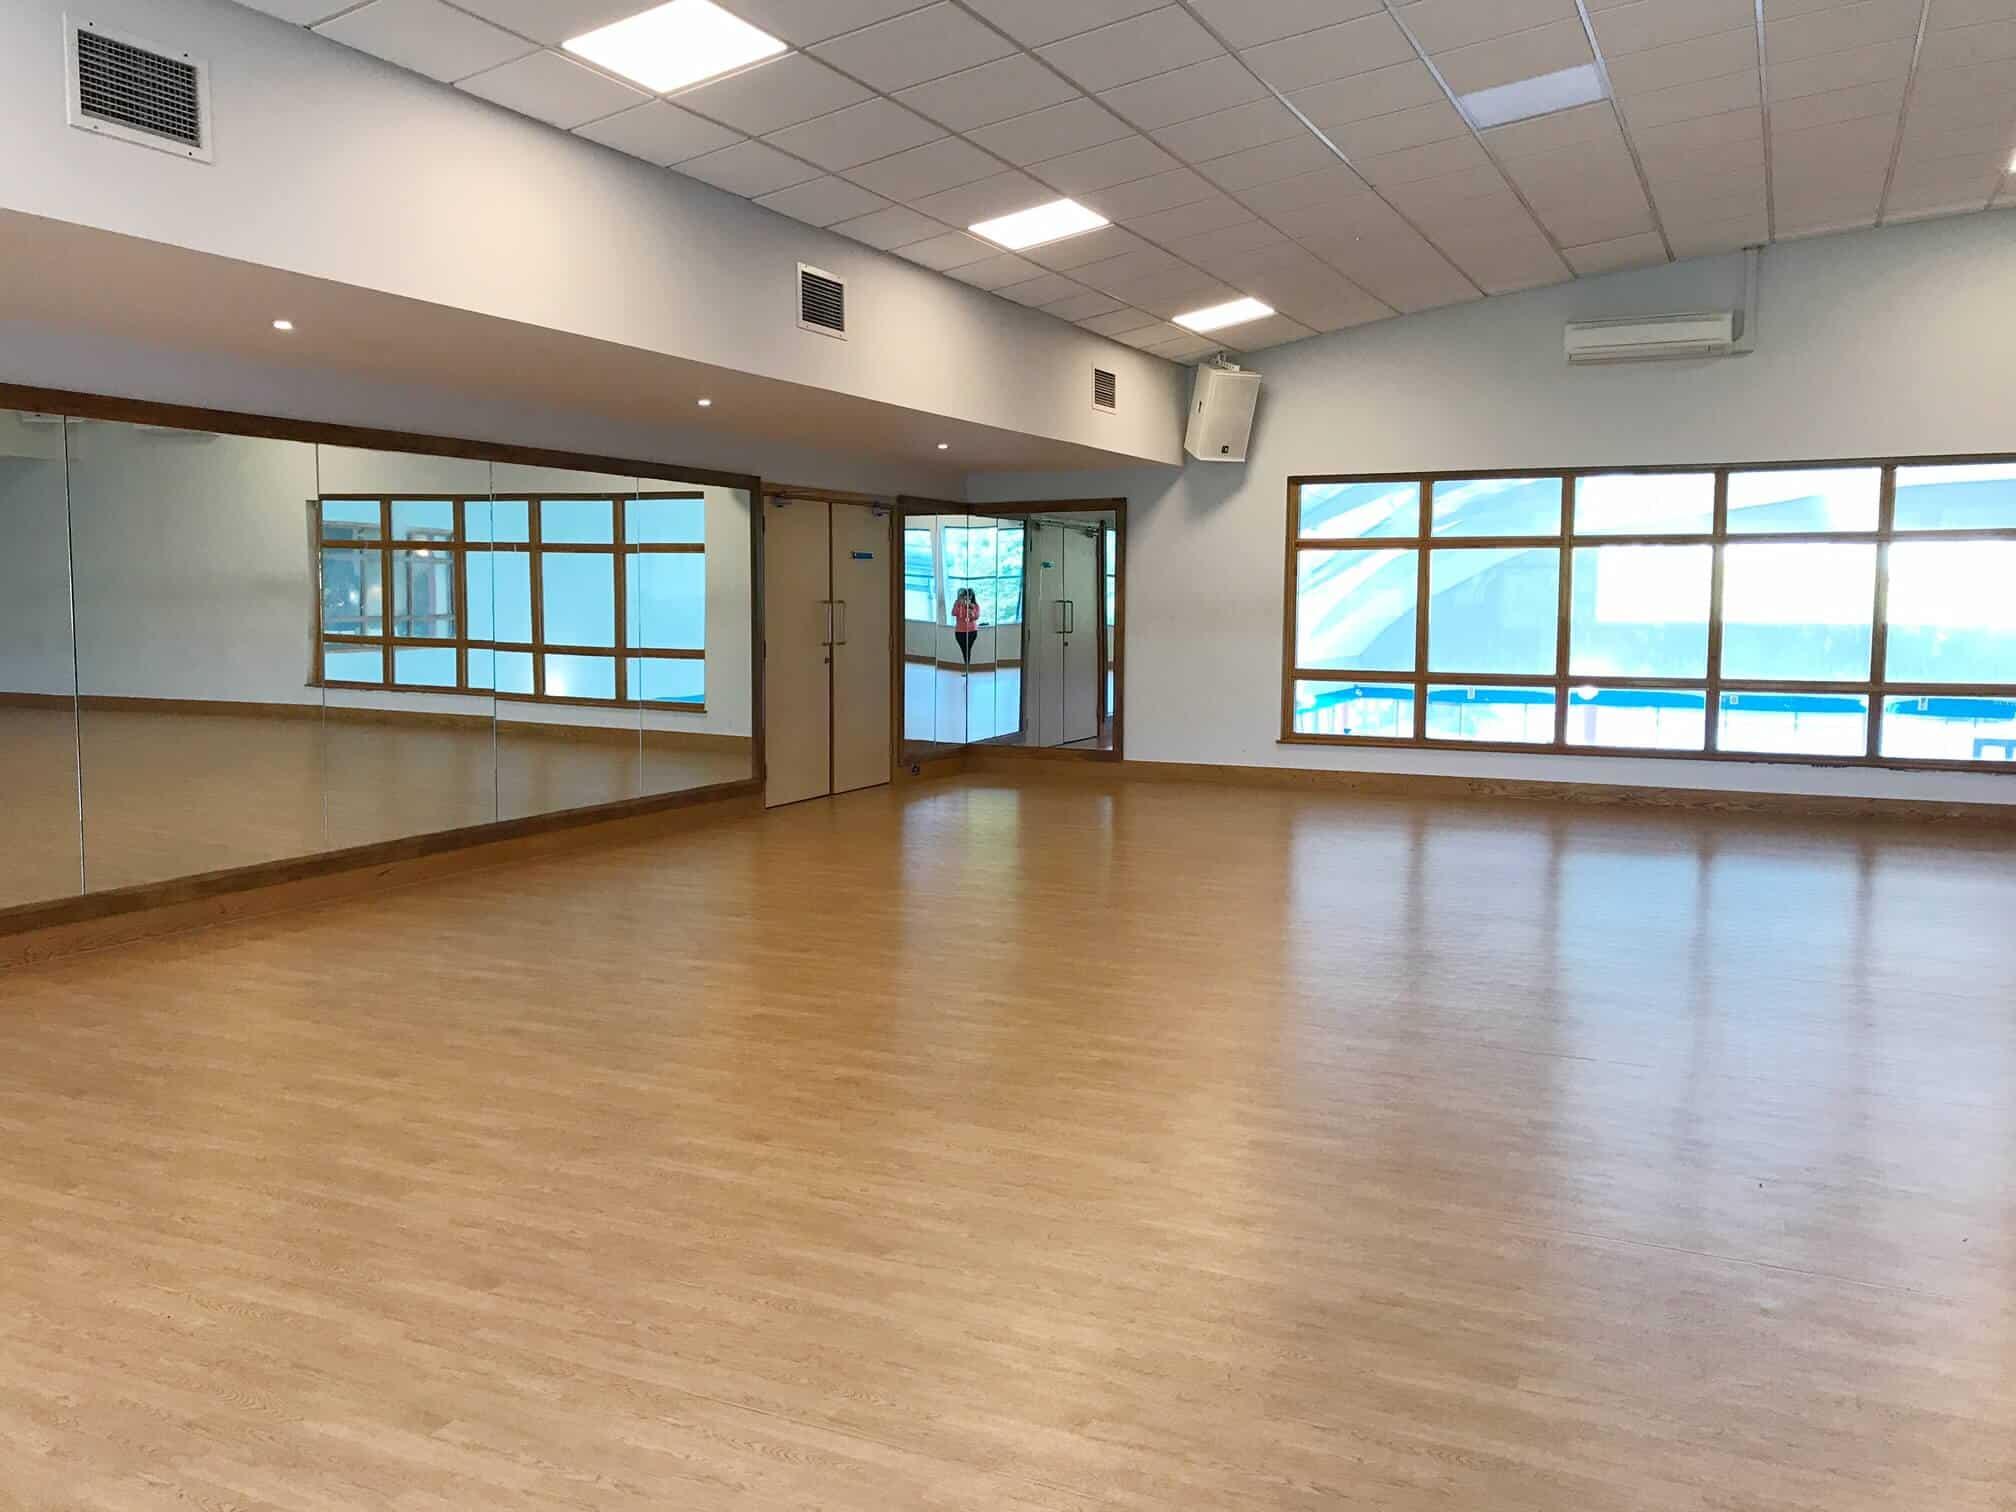 Fitness studio over loking the pool at David Lloyd in Milton Keynes